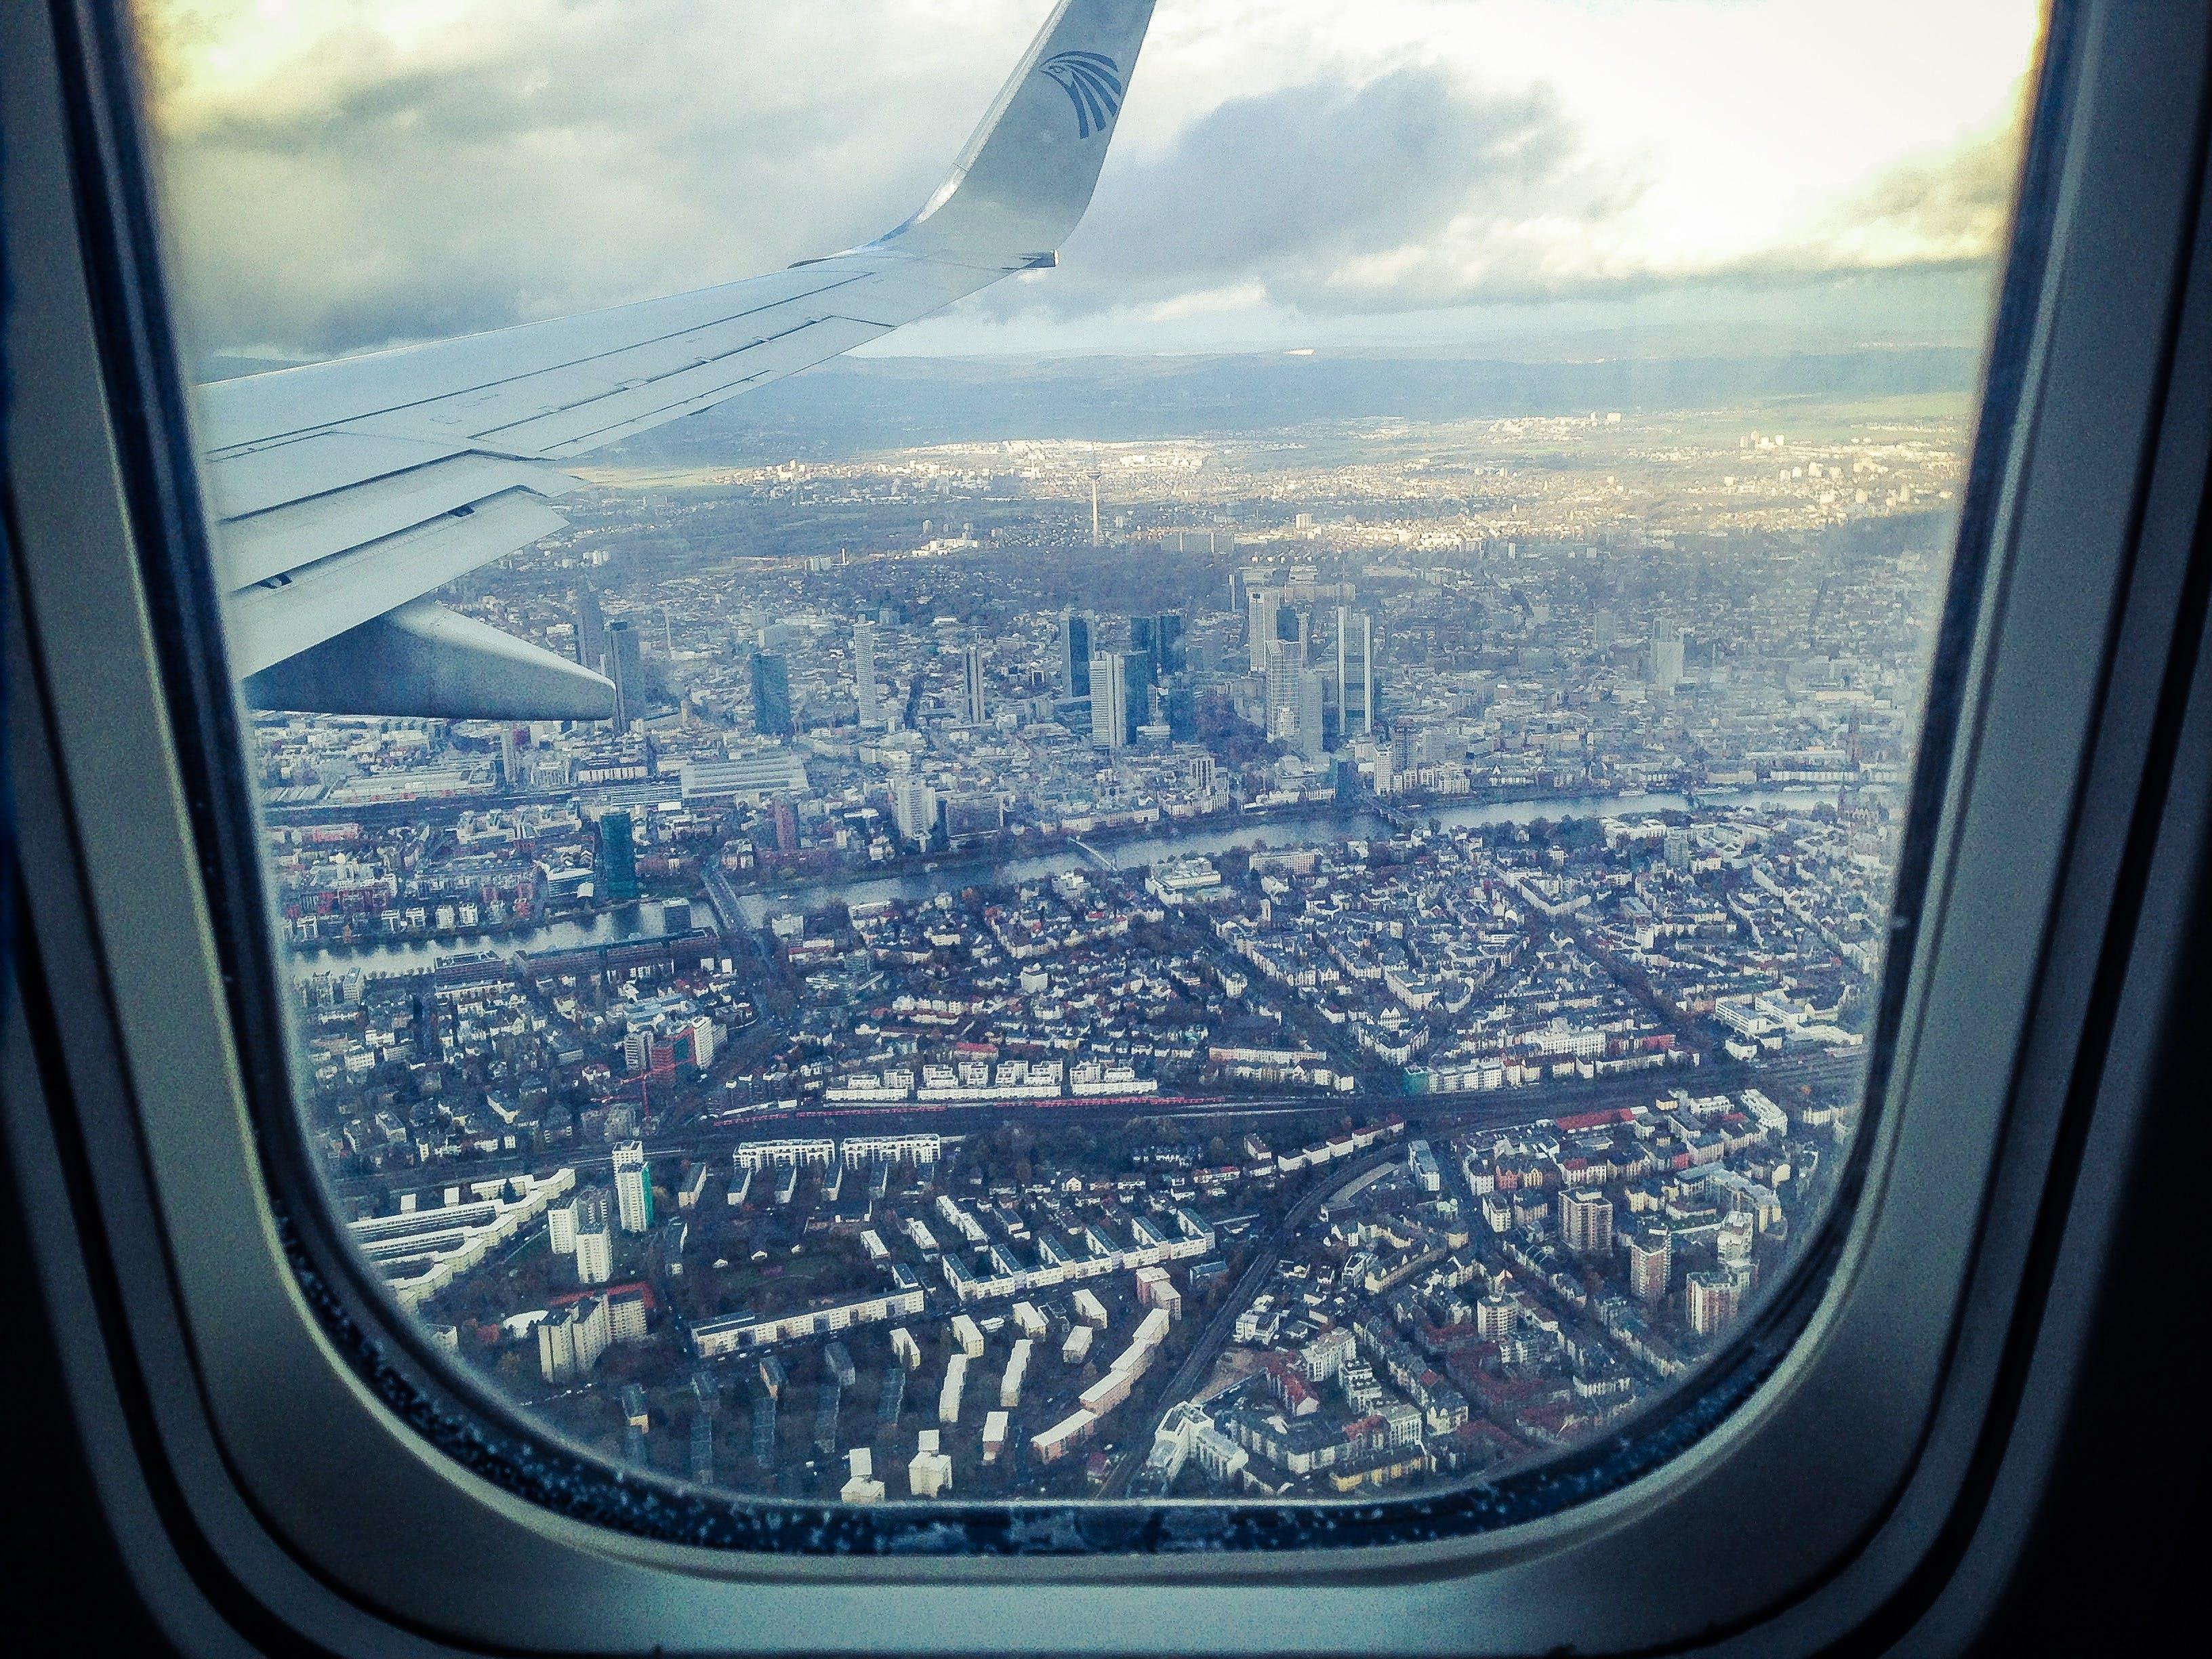 Airplane Windowpane Showing City Buildings